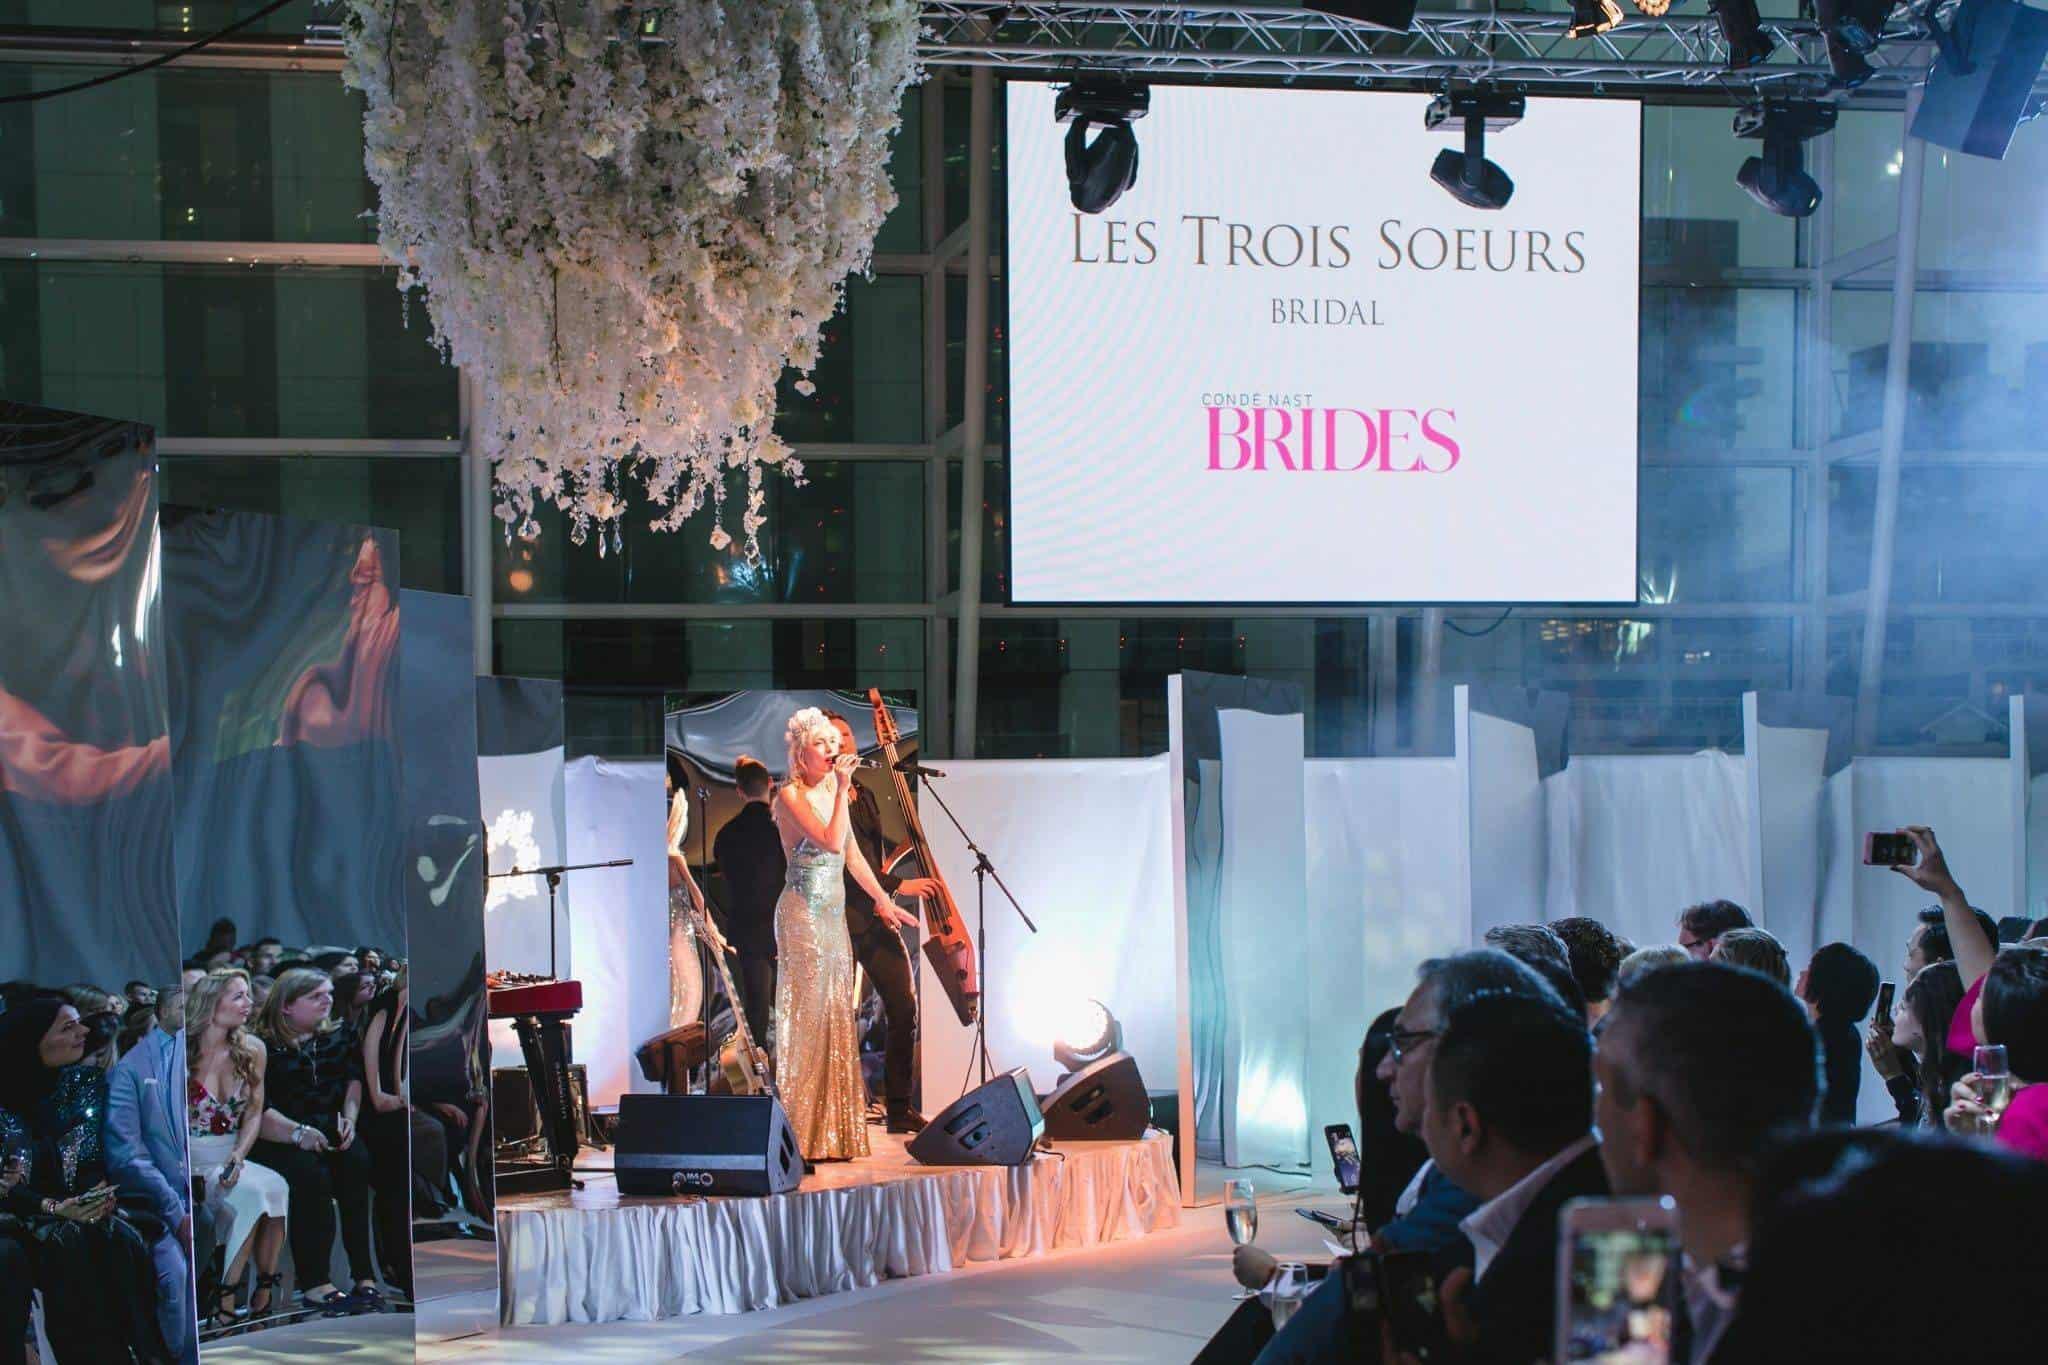 Lady Lingfield of Les Trois Soeurs, Temperley Bridal, Anna Kara, Caroline Castigliano, Lova Bridal, Daalarna Couture and David Fielden, brides magazine, jimmy choo